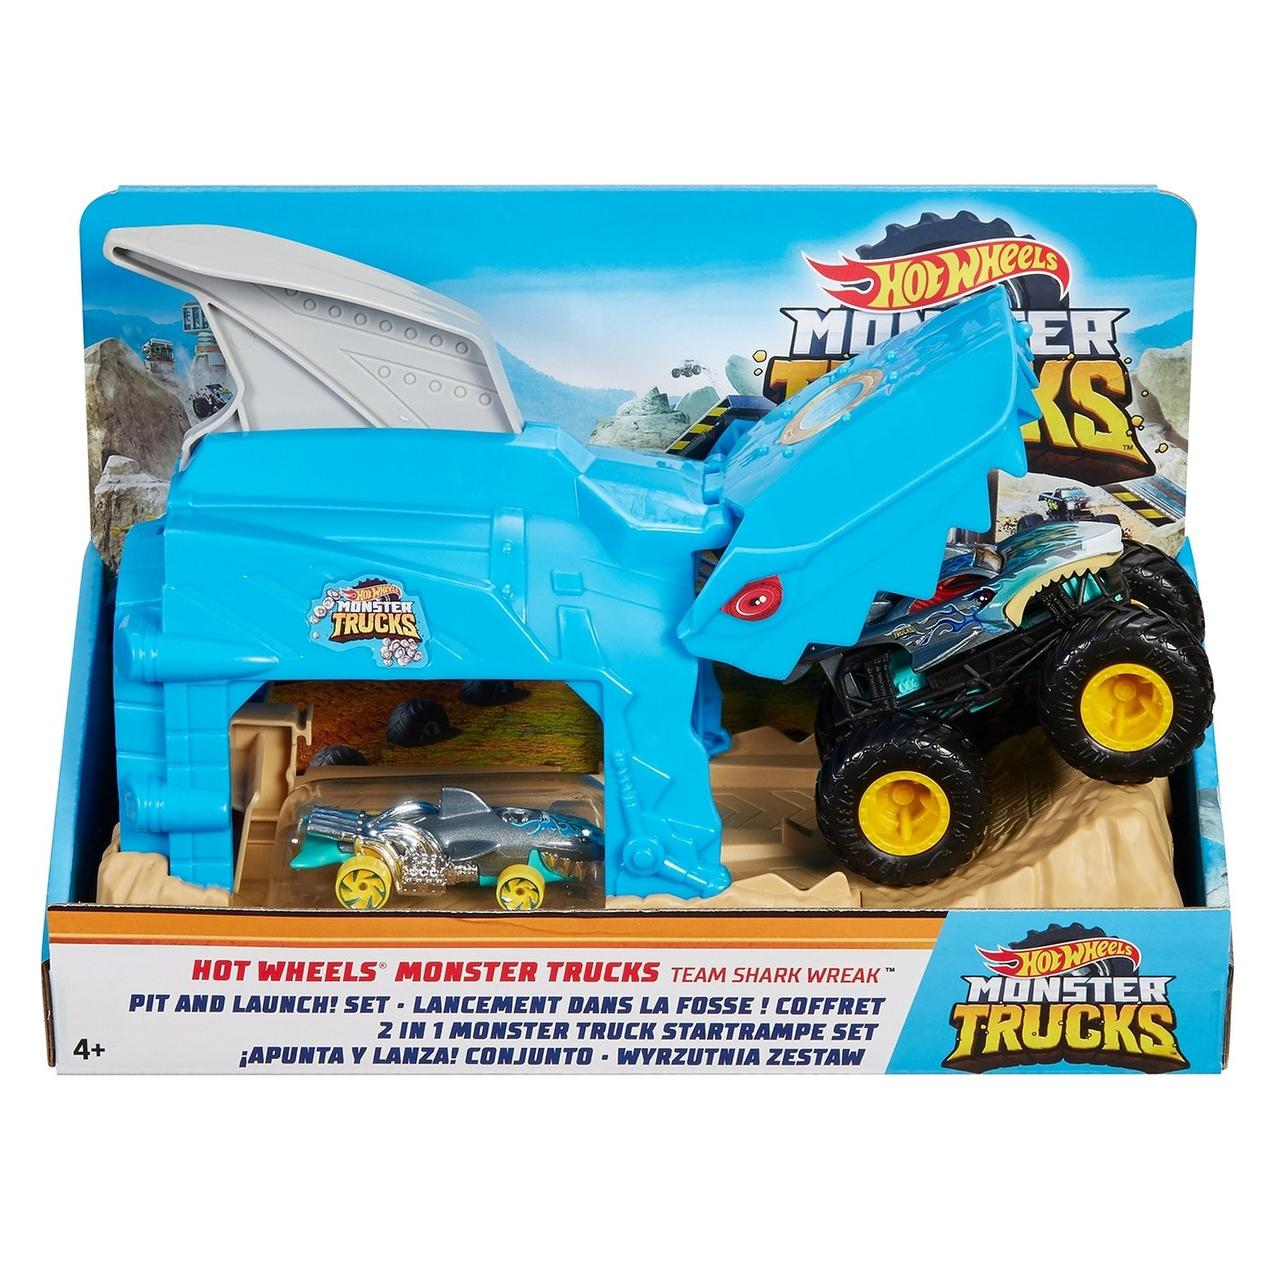 "Hot Wheels Игровой набор ""Monster Trucks: Выполняй трюки и запускай Команда Shark Wreak, Хот Вилс"